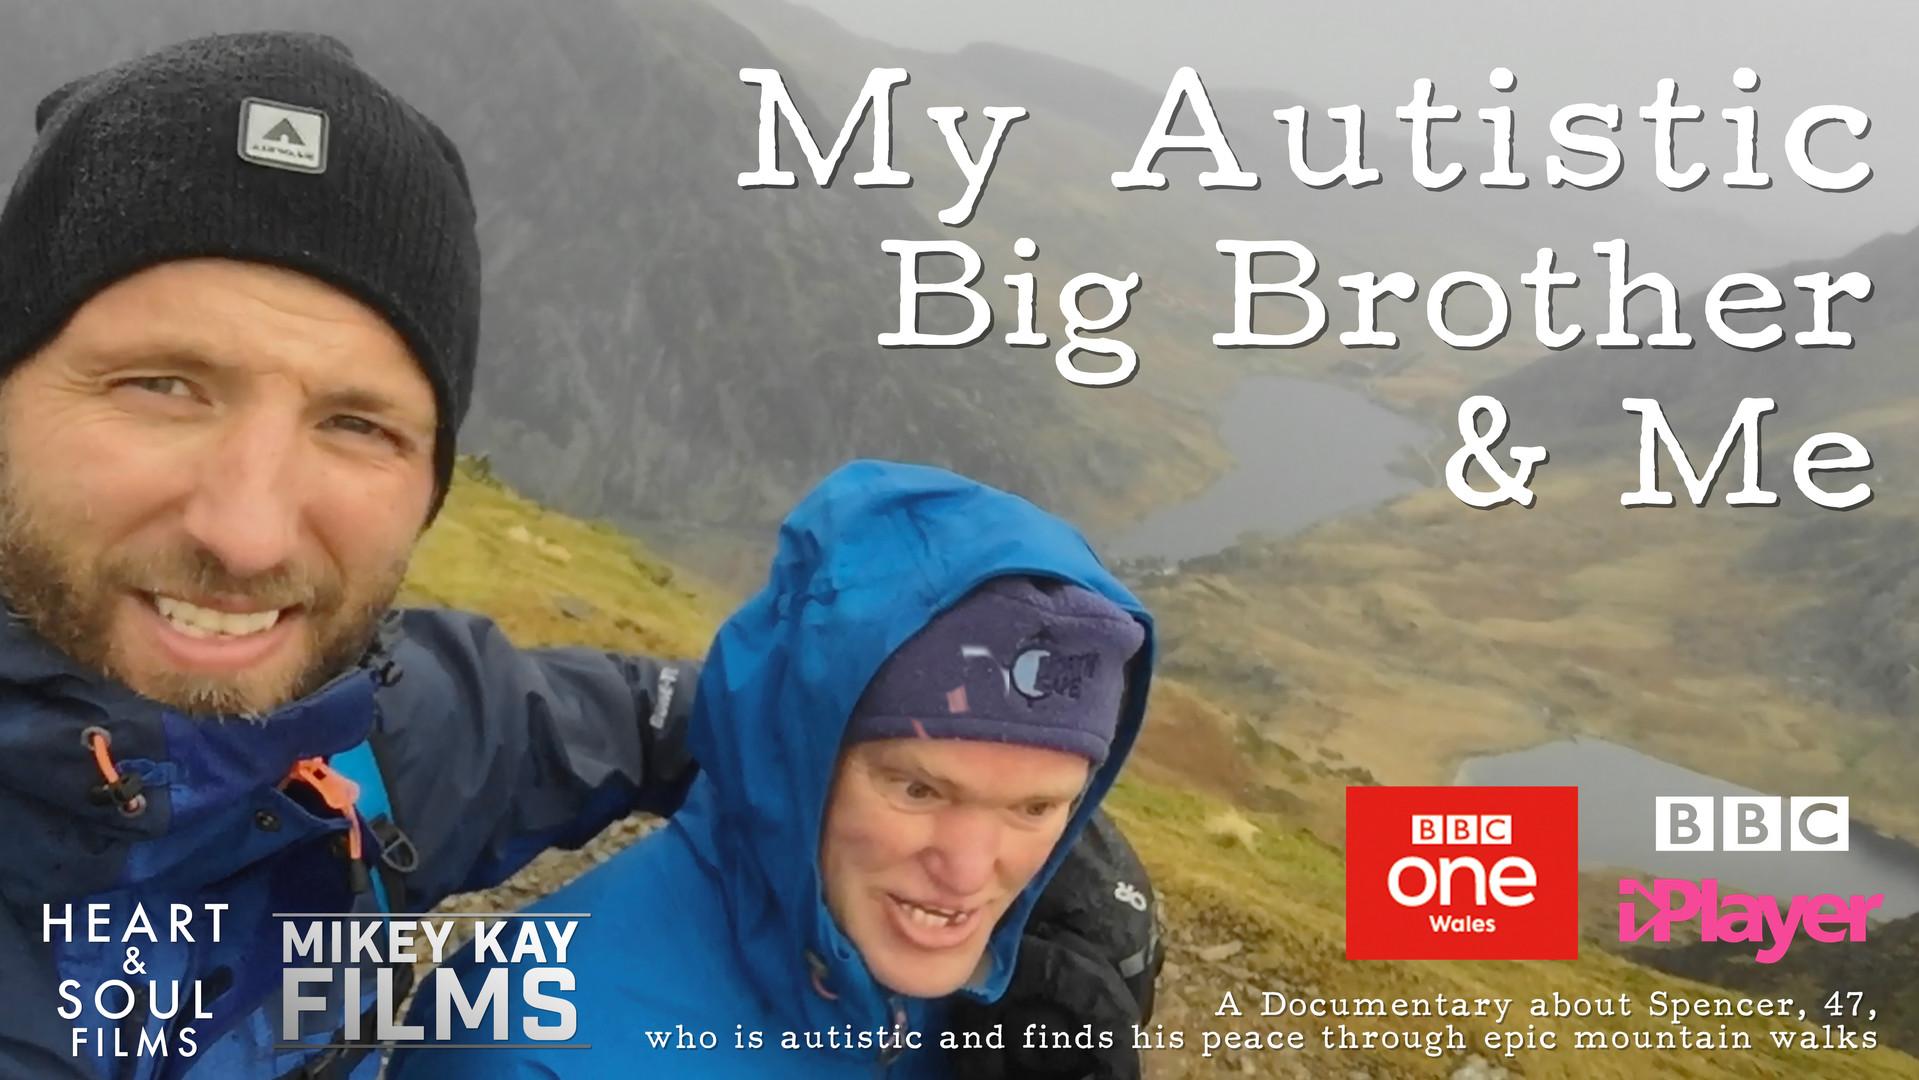 My Autistic Big Brother & Me